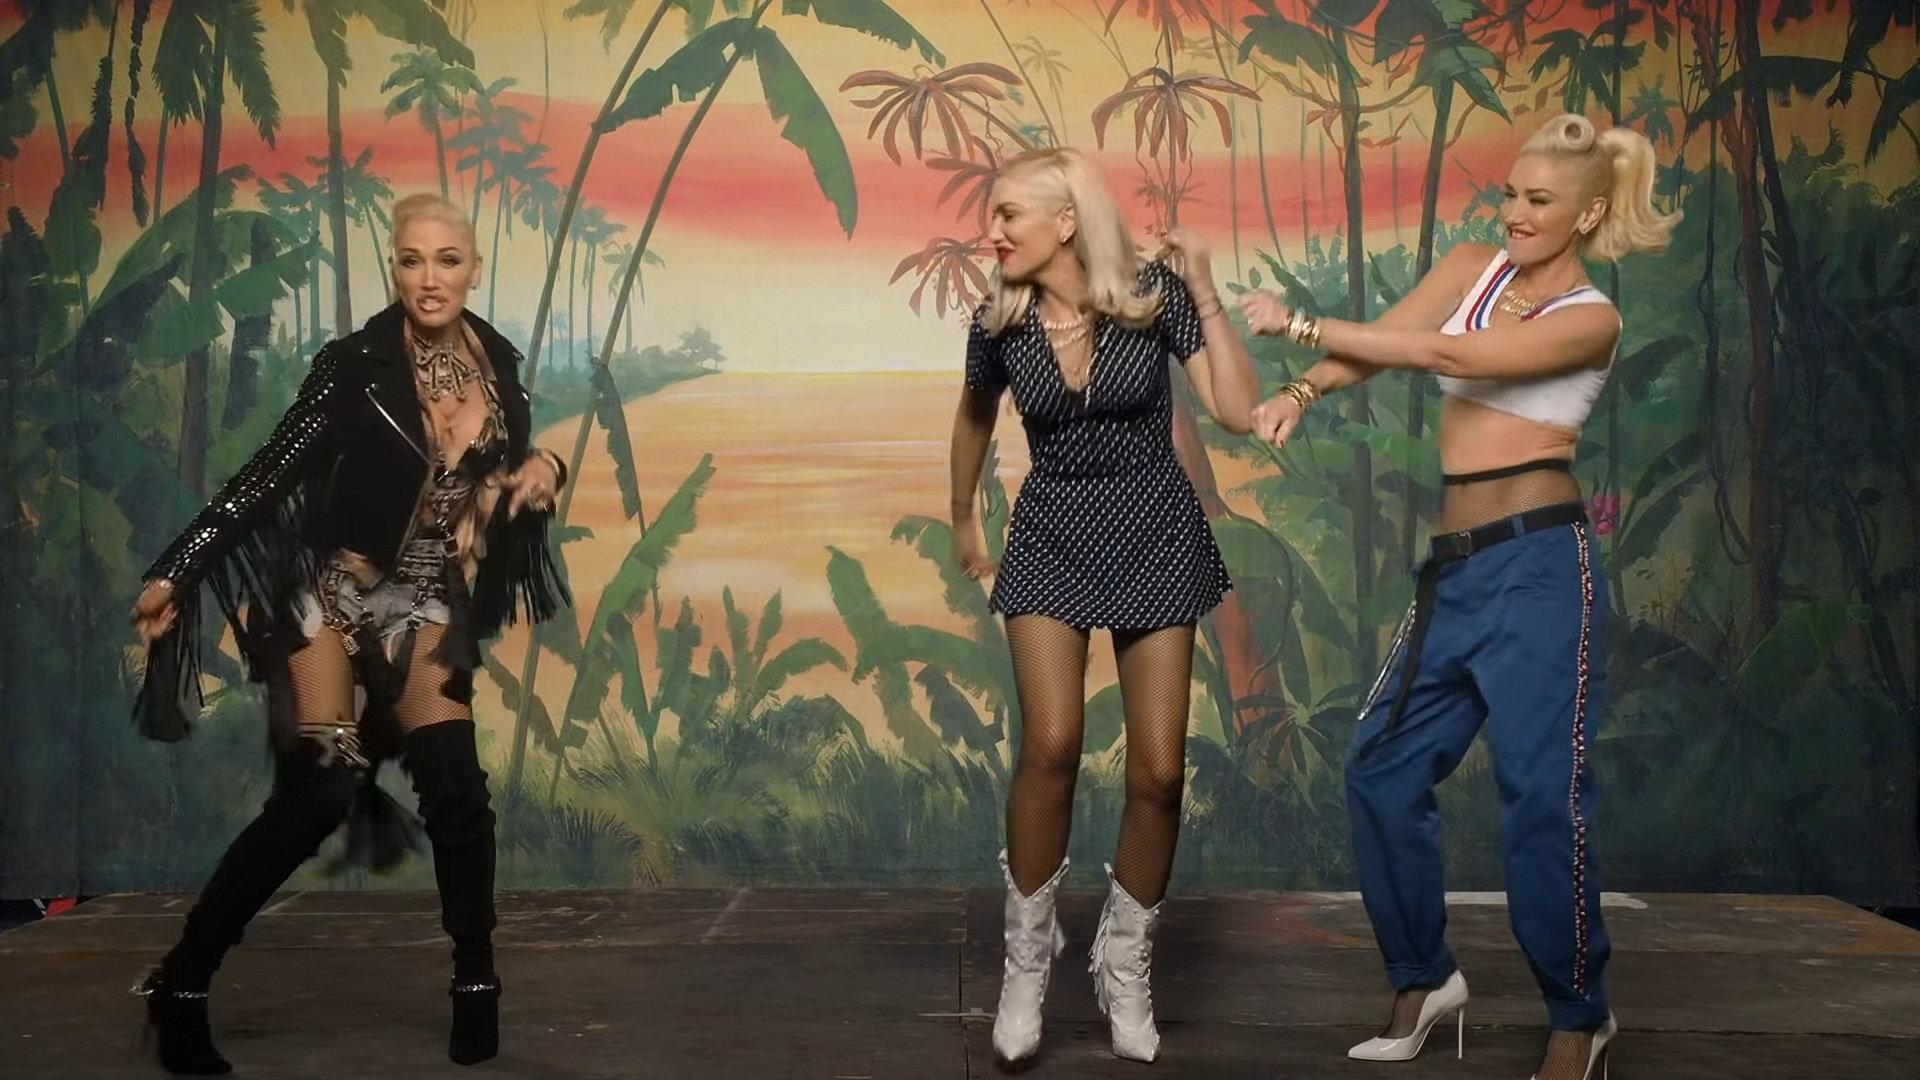 Gwen Stefani - Let Me Reintroduce Myself (Official Video) 2-40 Screenshot